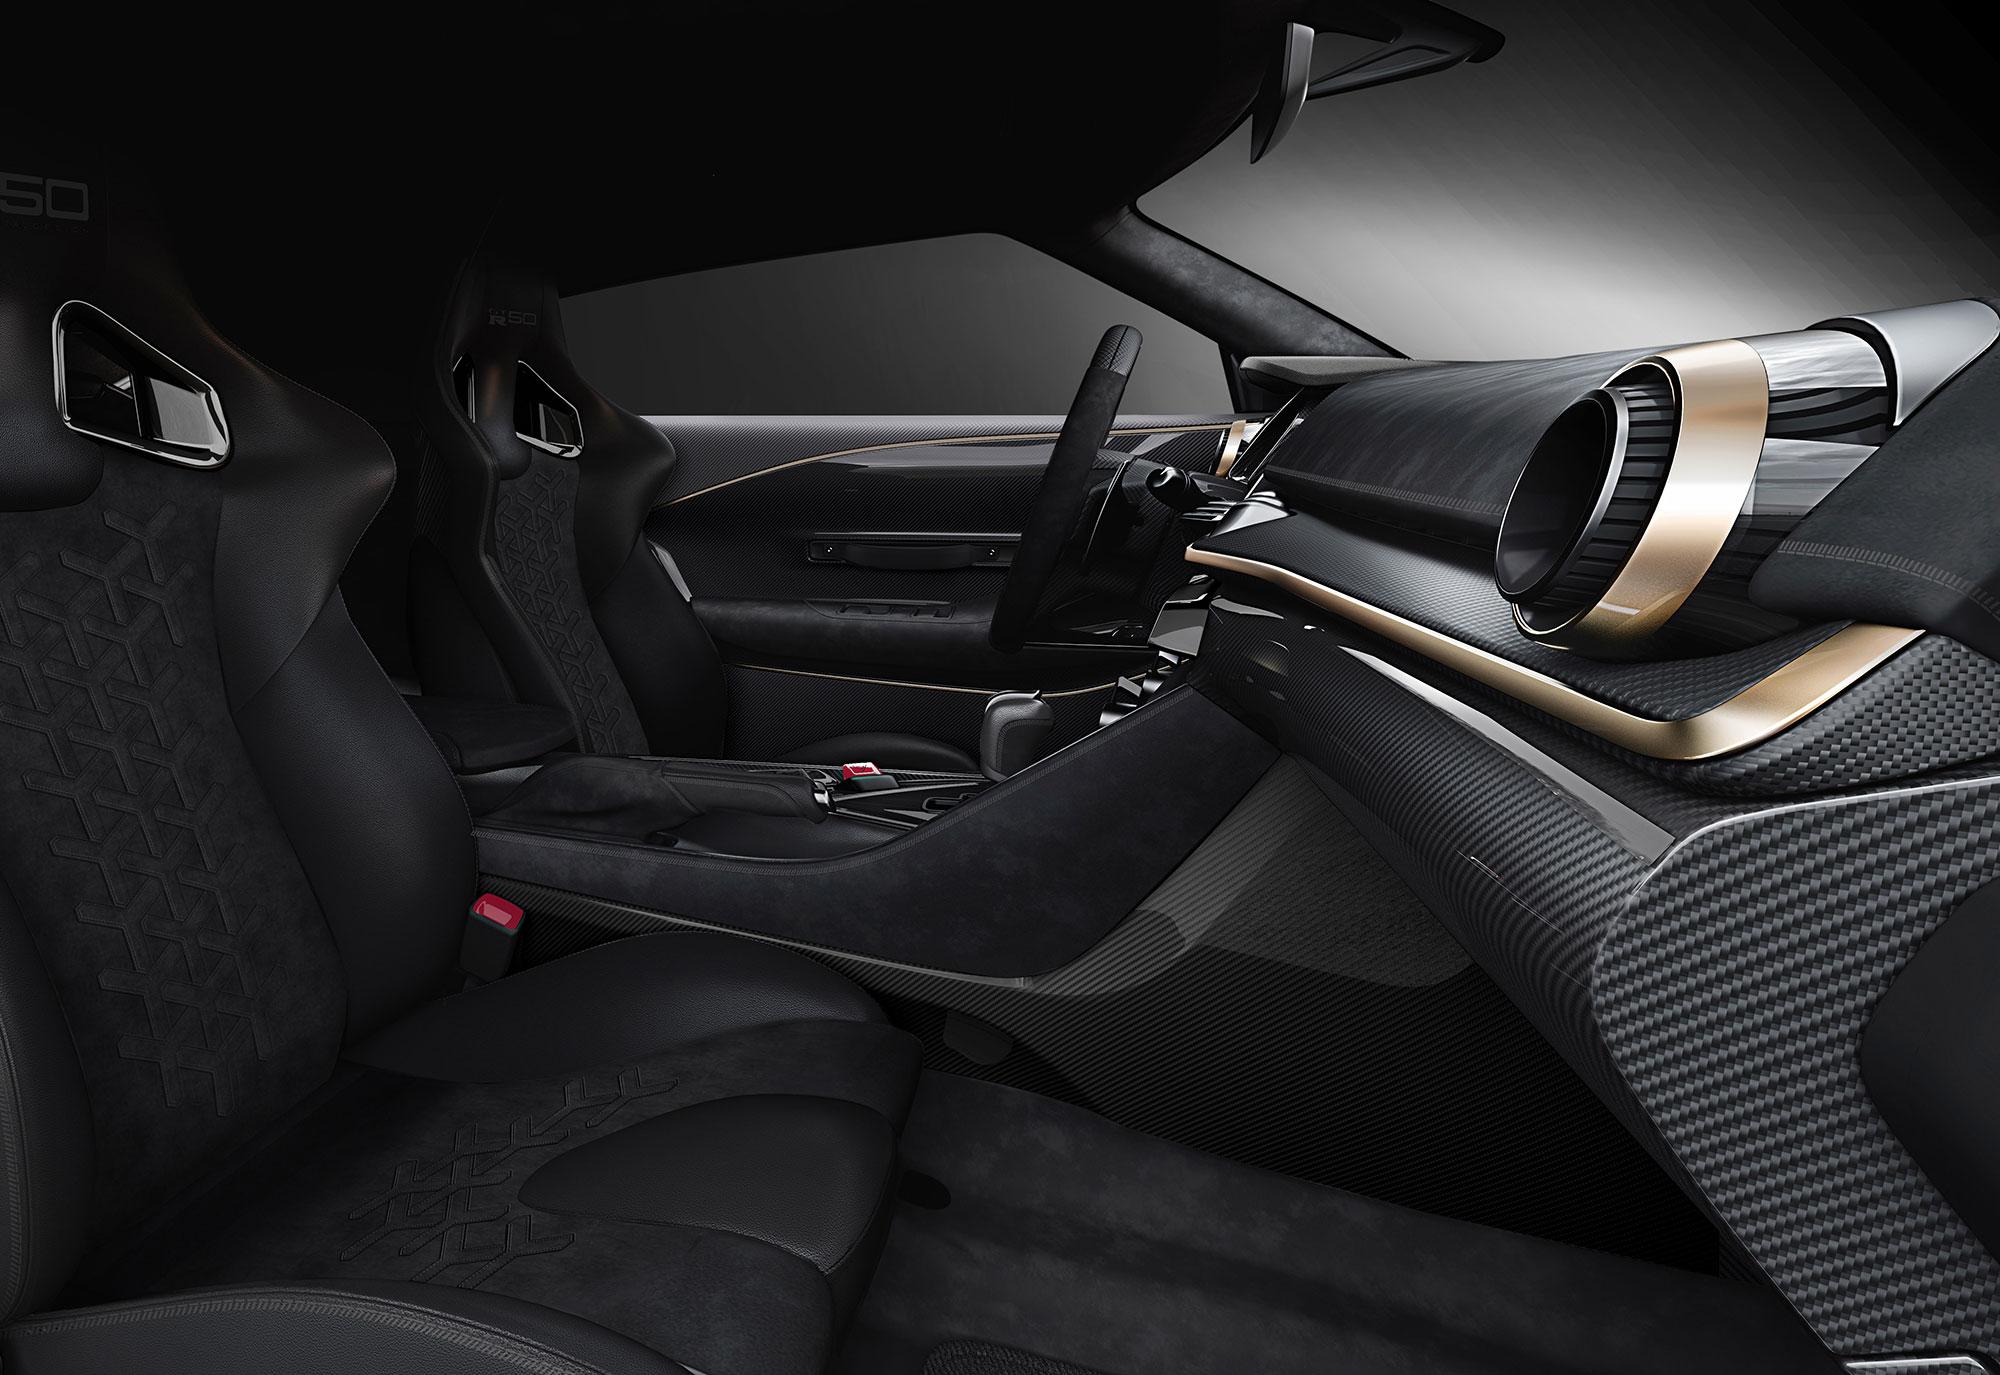 2018-06-26-Nissan-GT-R50-by-Italdesign-INTERIOR-IMAGE-3.jpg